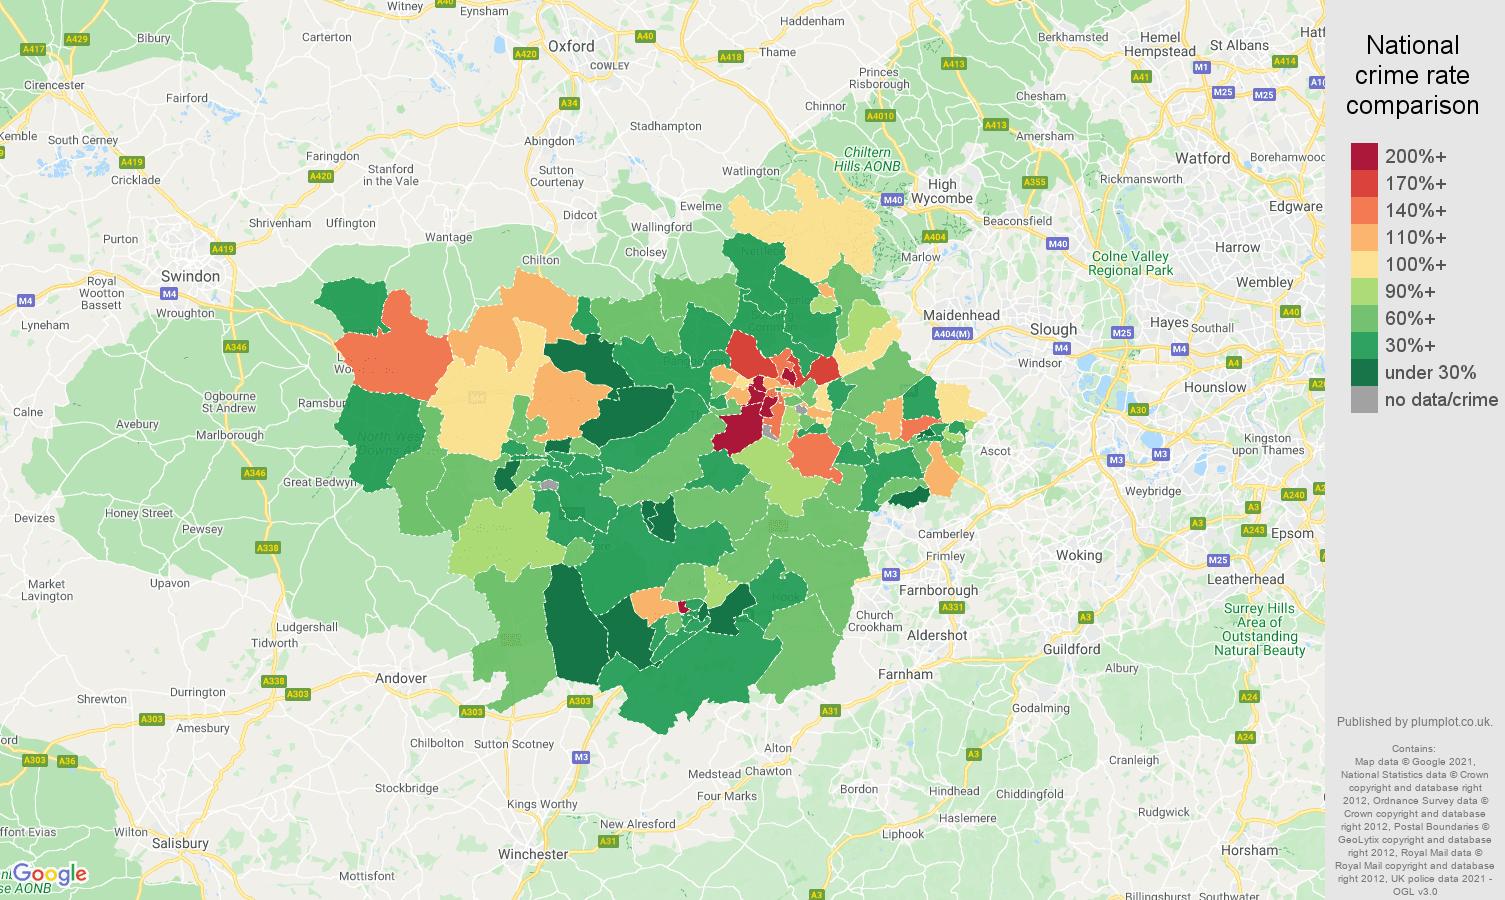 Reading vehicle crime rate comparison map